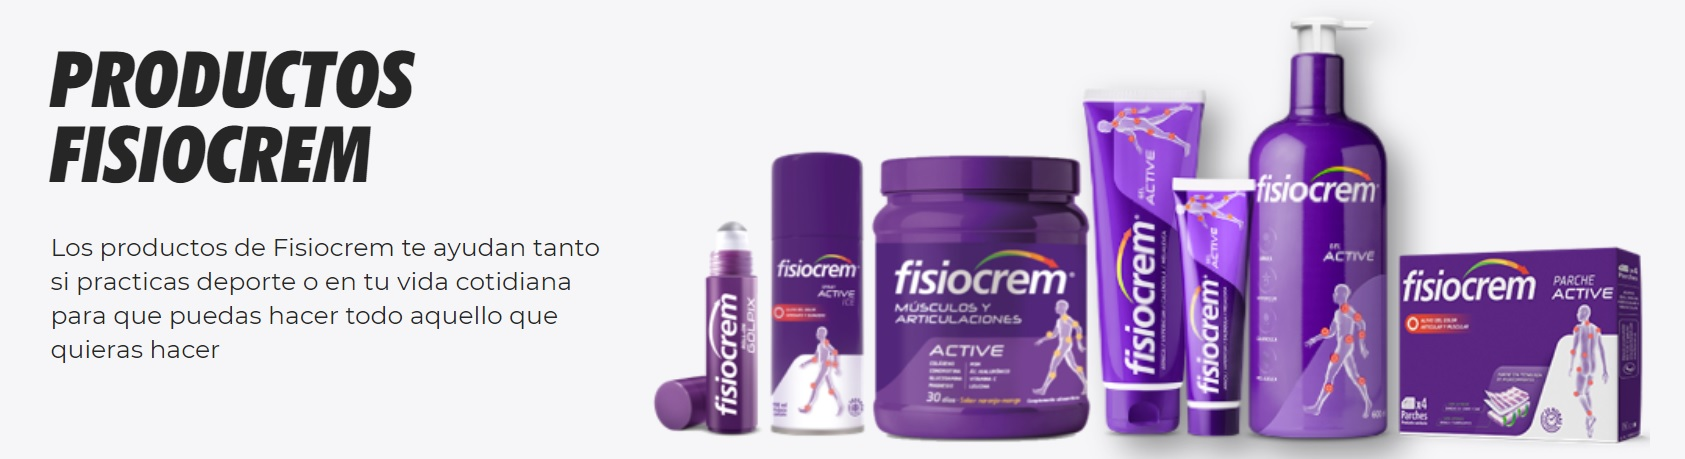 Fisiocrem Gel Active